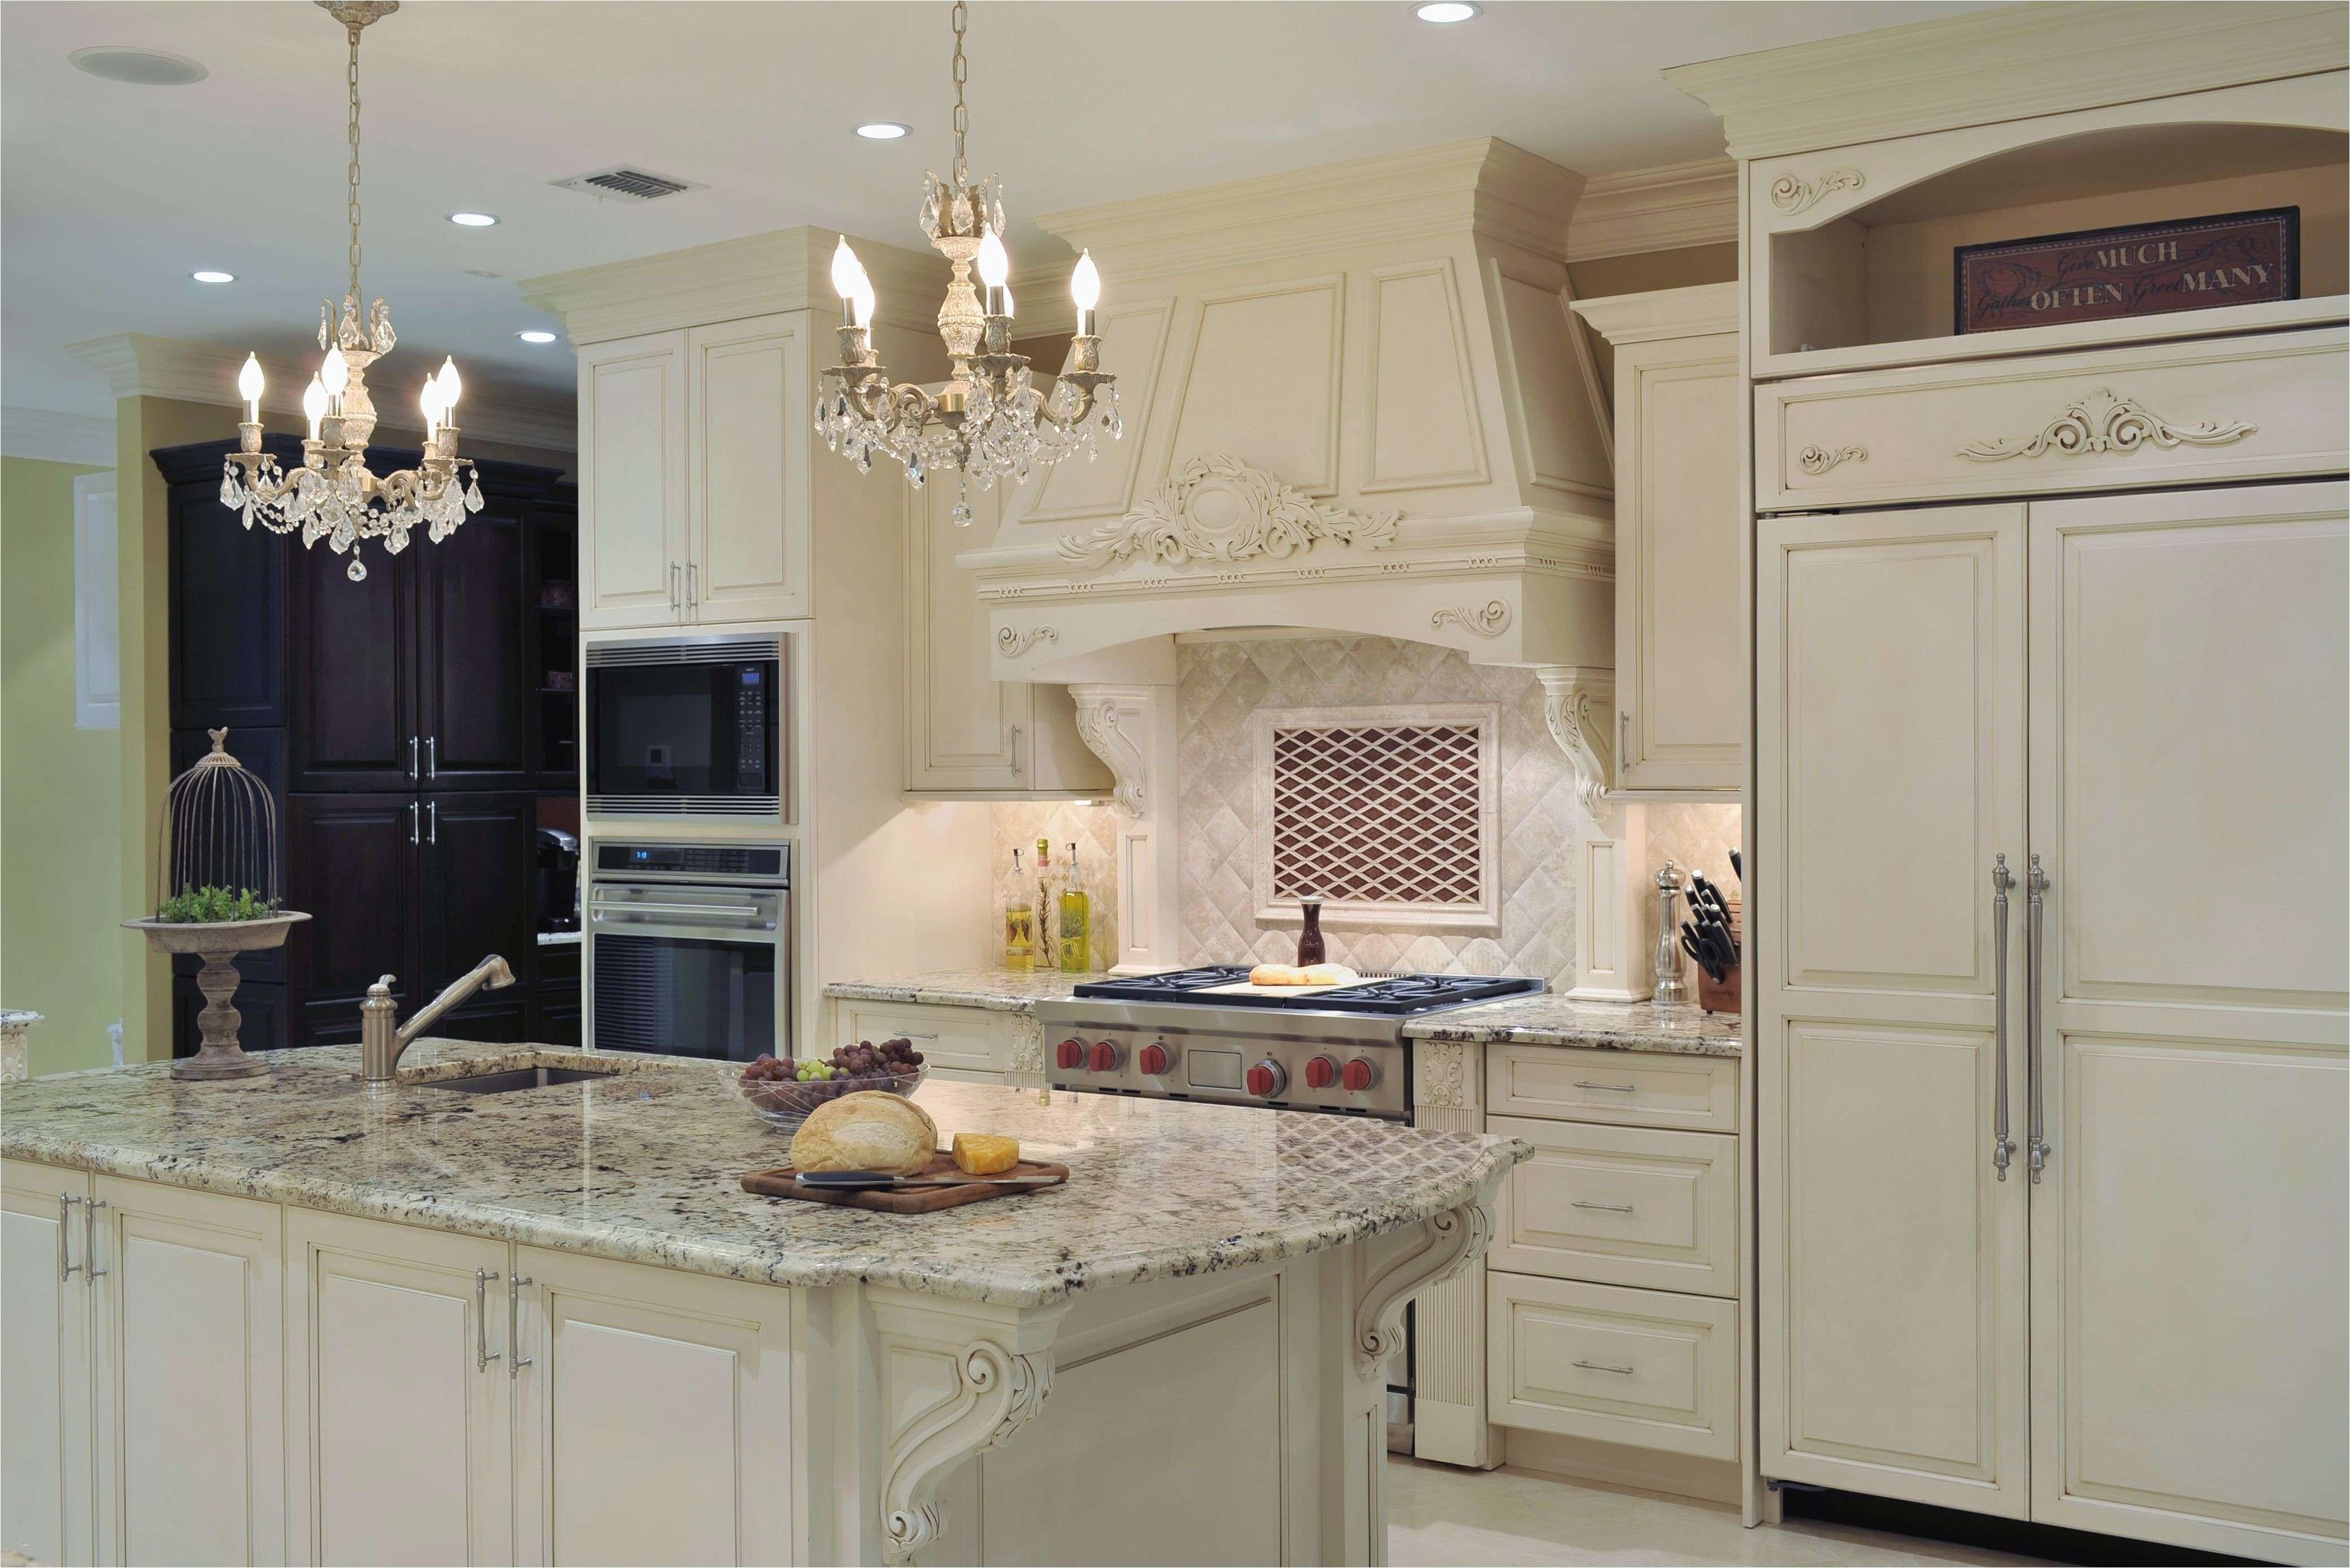 Cream Kitchen Cabinets Motivational White or Cream Kitchen Cabinets